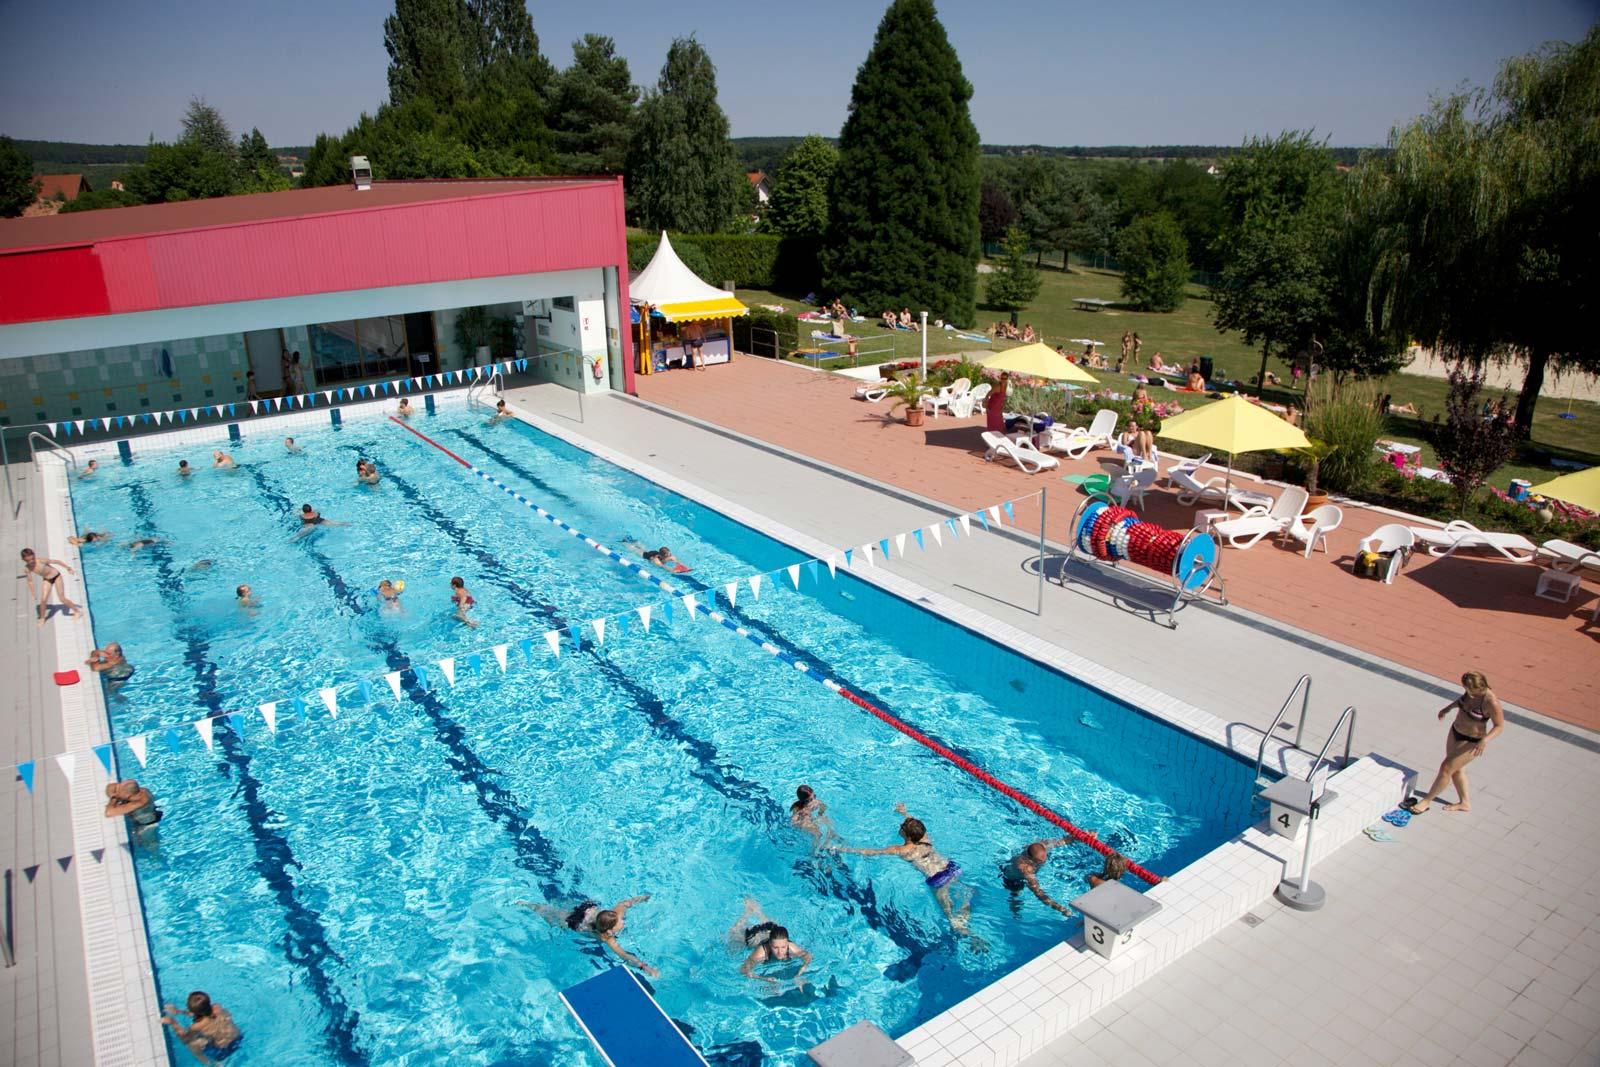 piscine  u00e9t u00e9  hiver - les aqualies